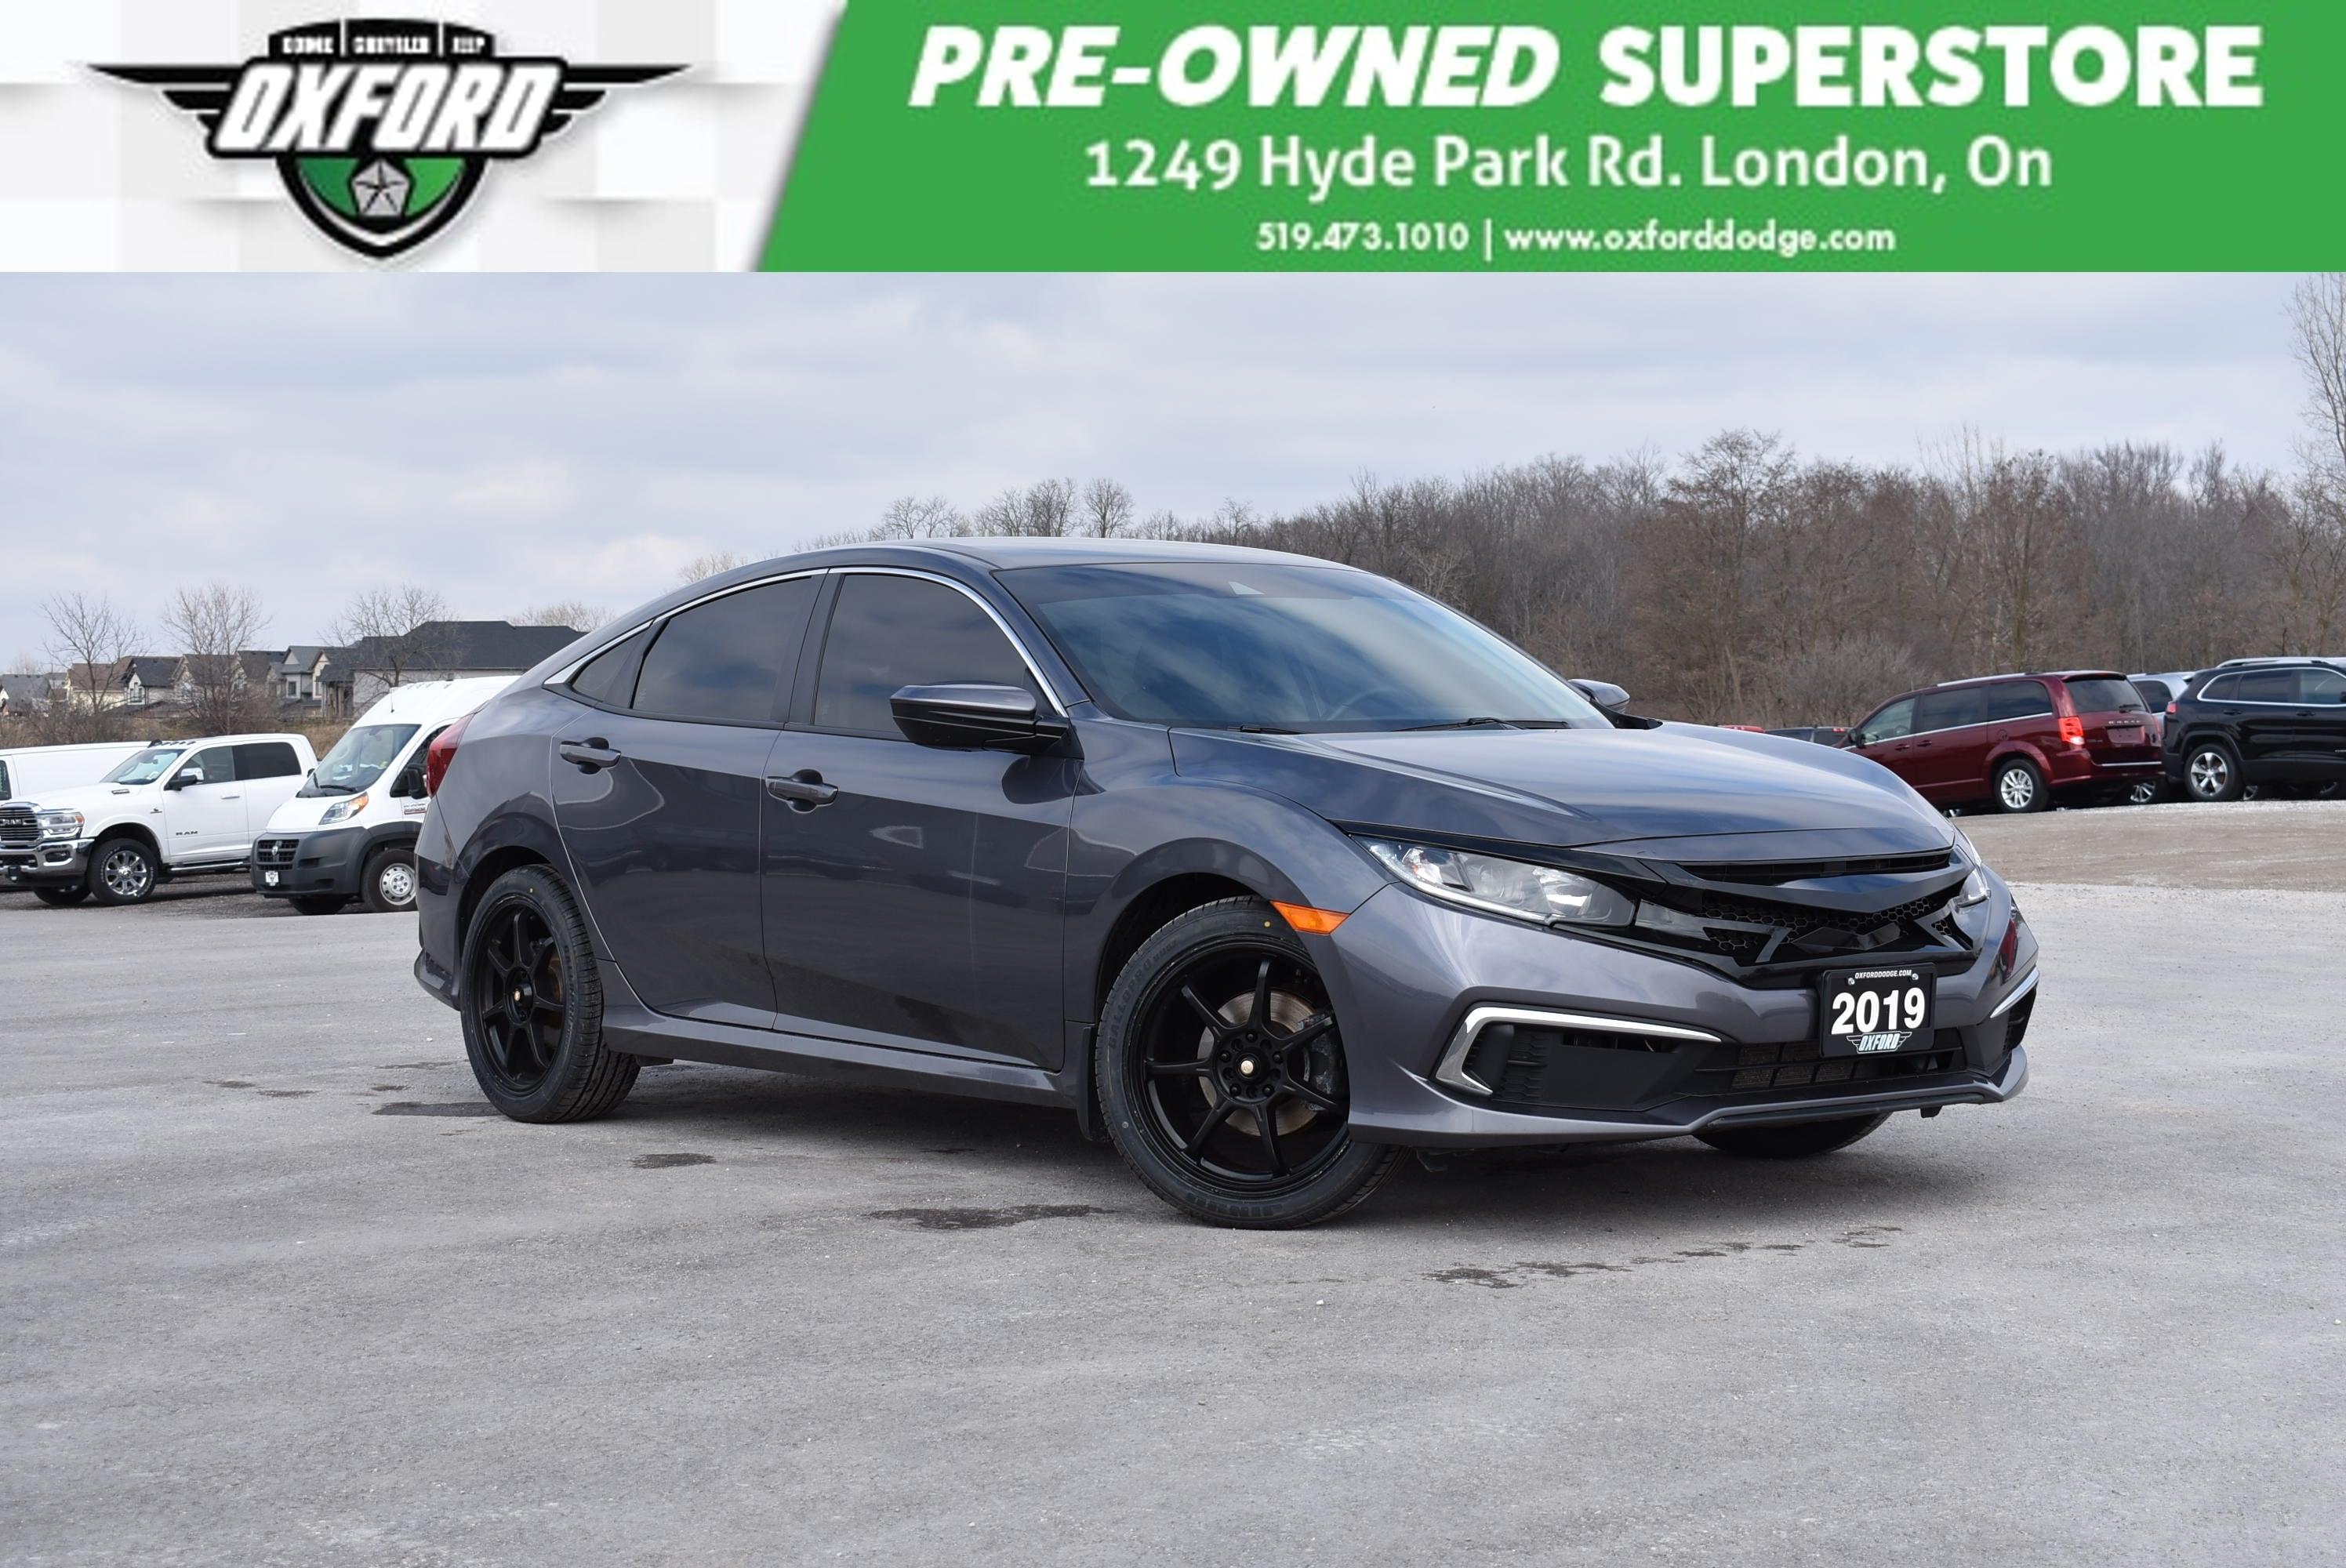 used 2019 Honda Civic car, priced at $18,988